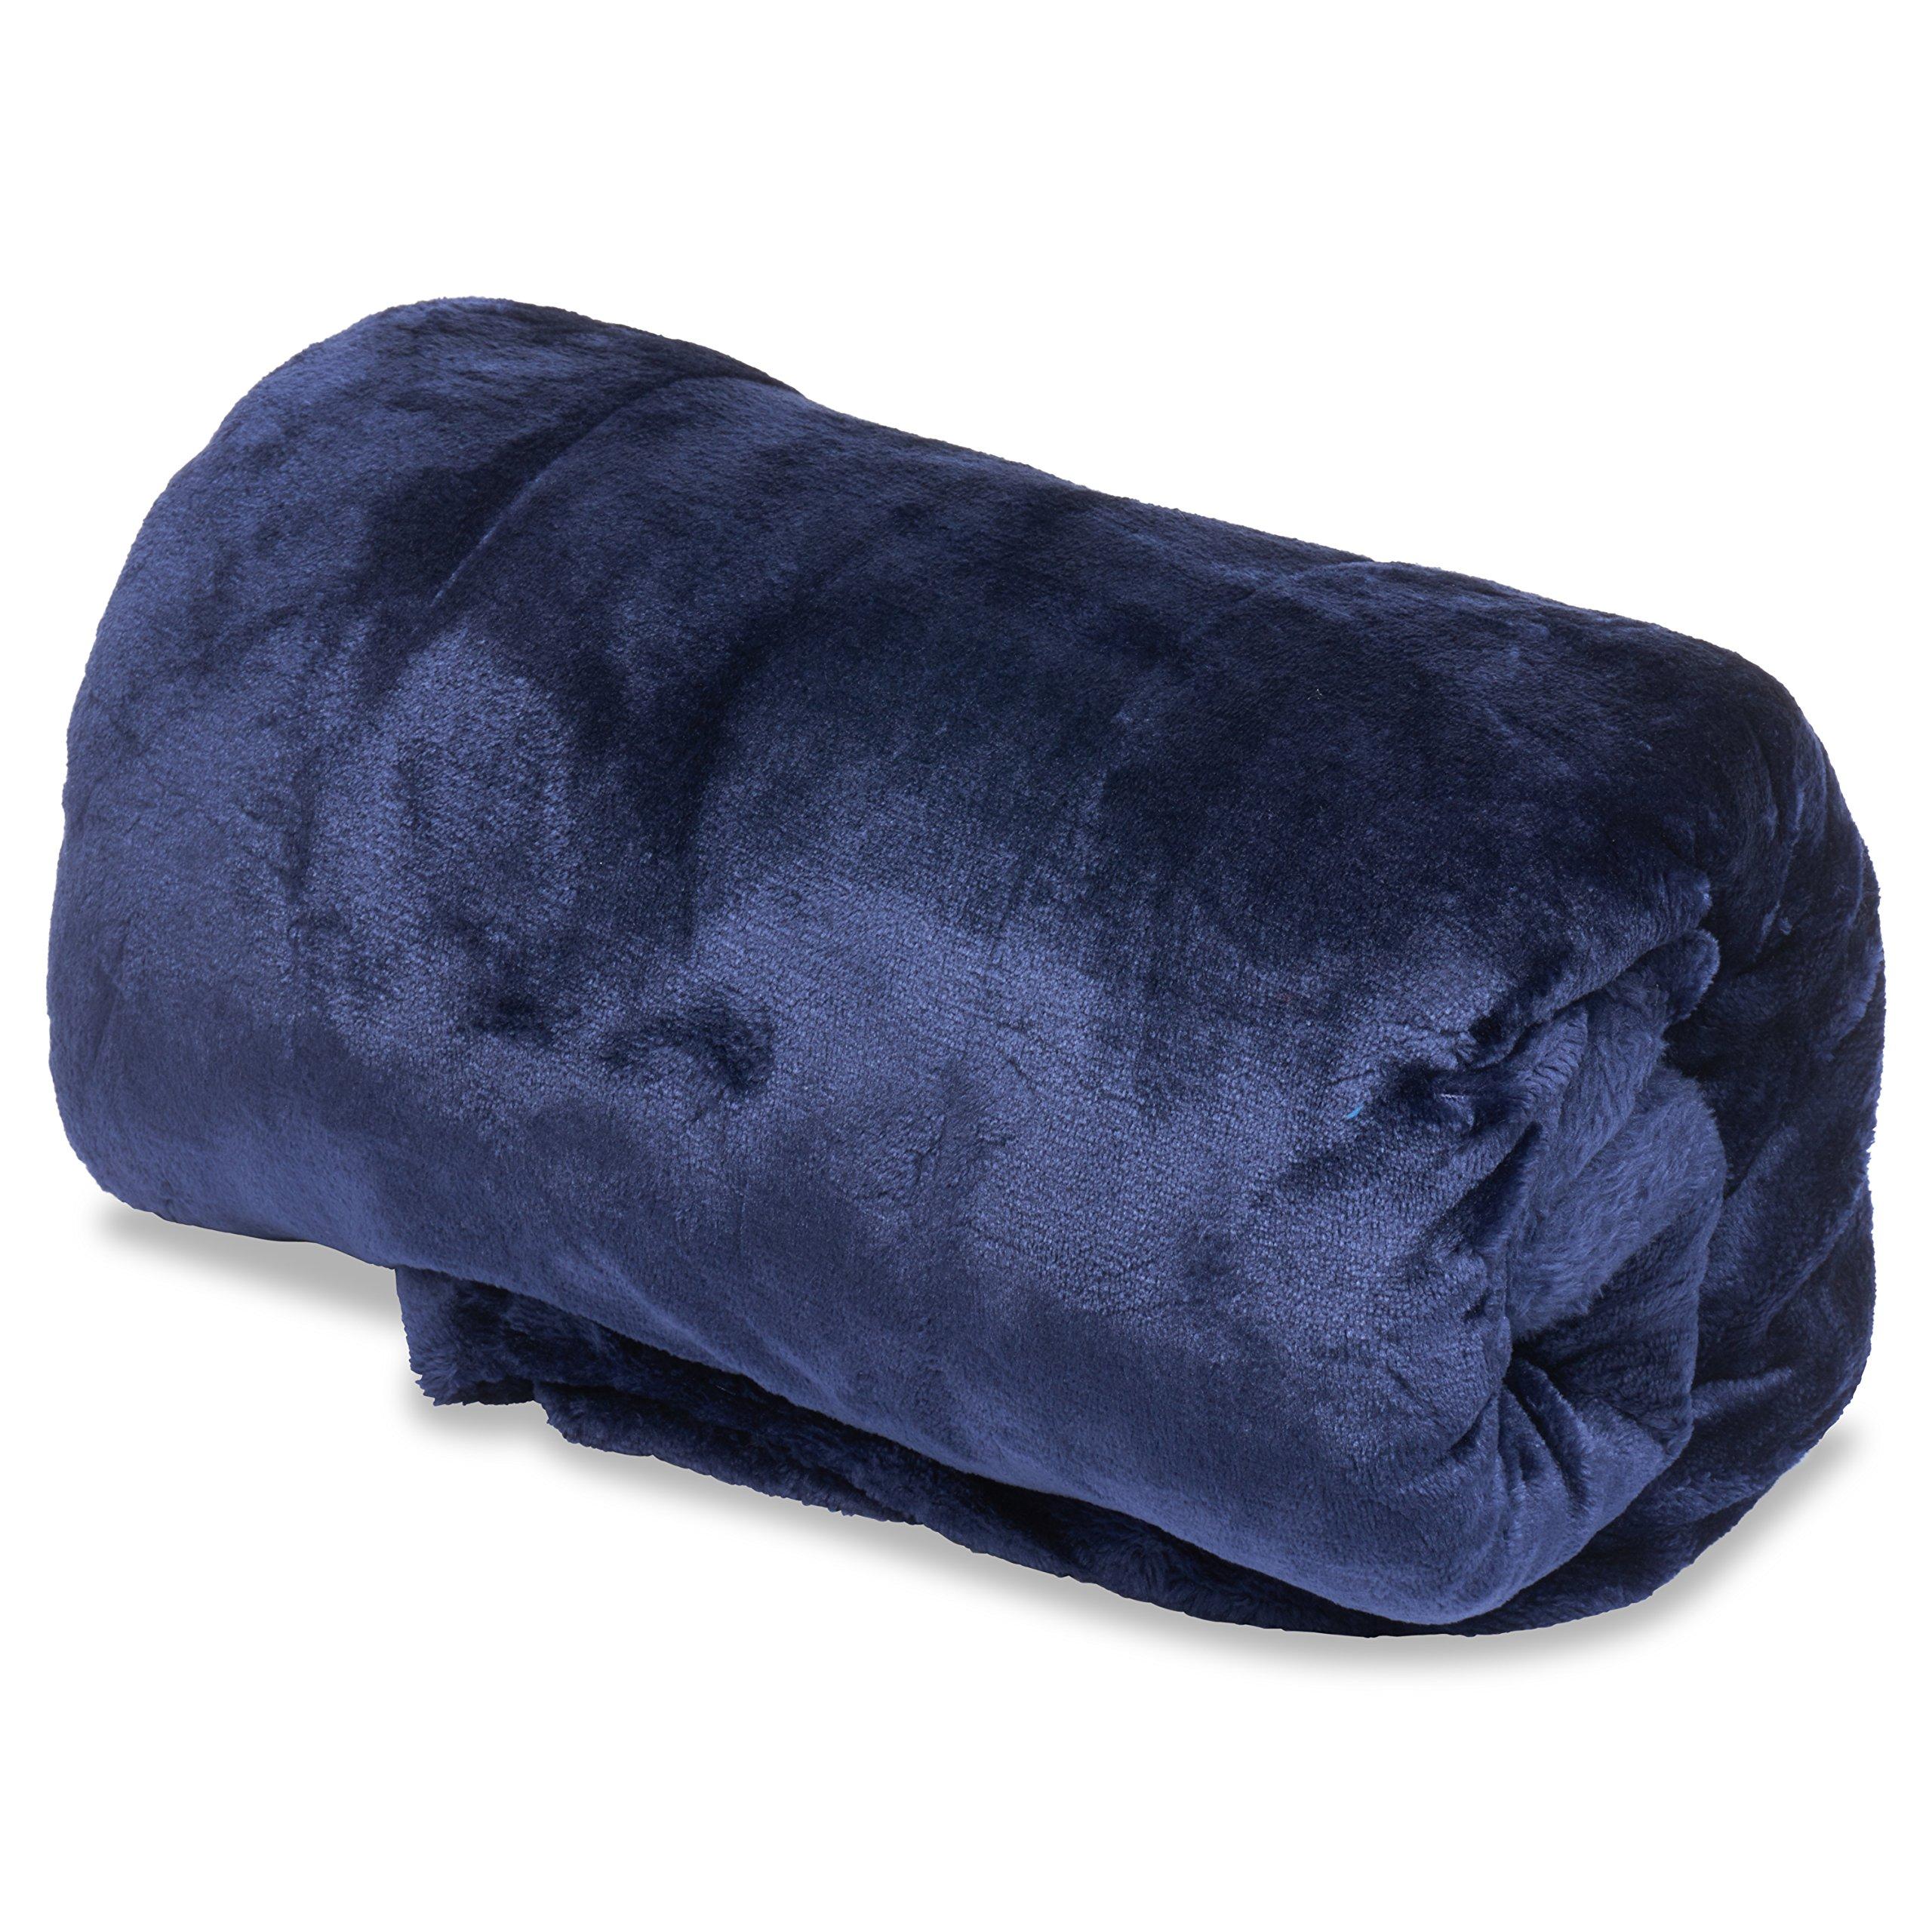 OVERSIZED 50x 80 Vera Reversible Extra Comfortable Microfiber Blanket - Navy